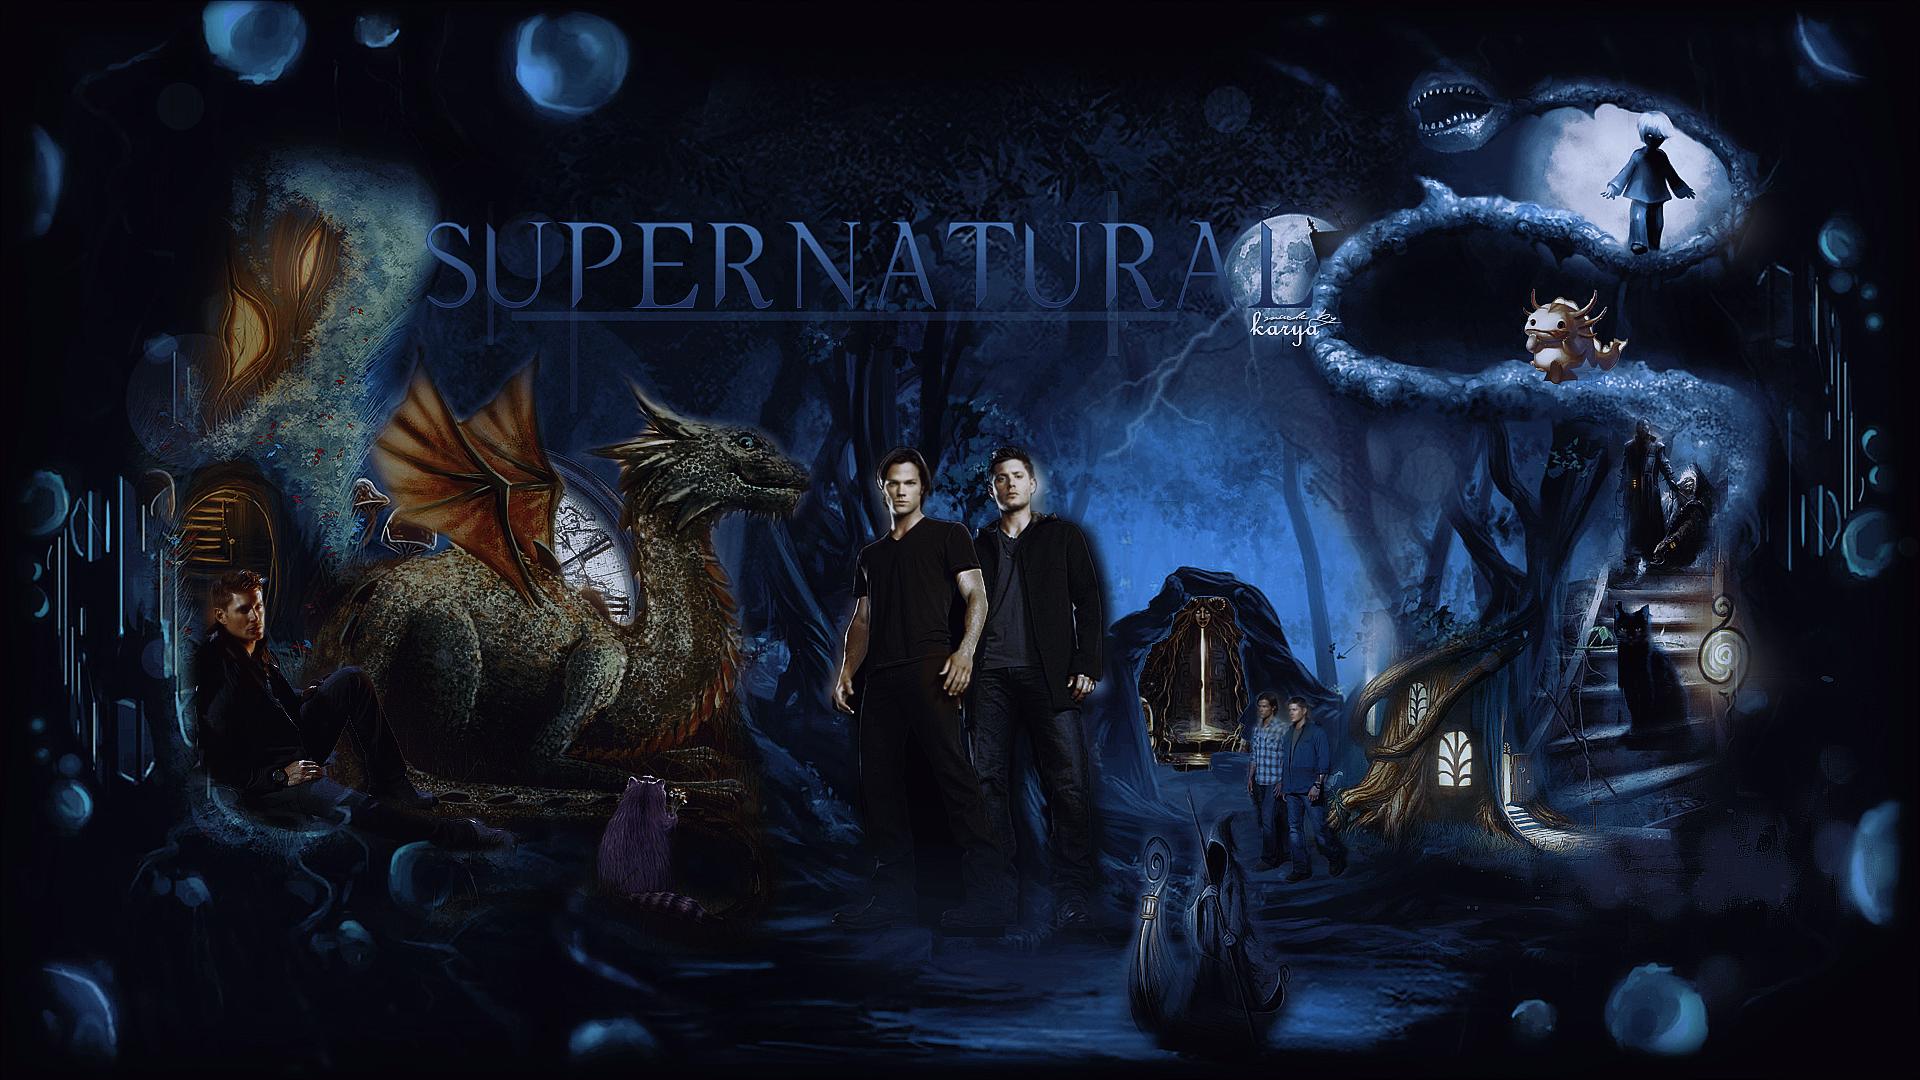 supernatural wallpaper livejournal justromanova photo 1920x1080